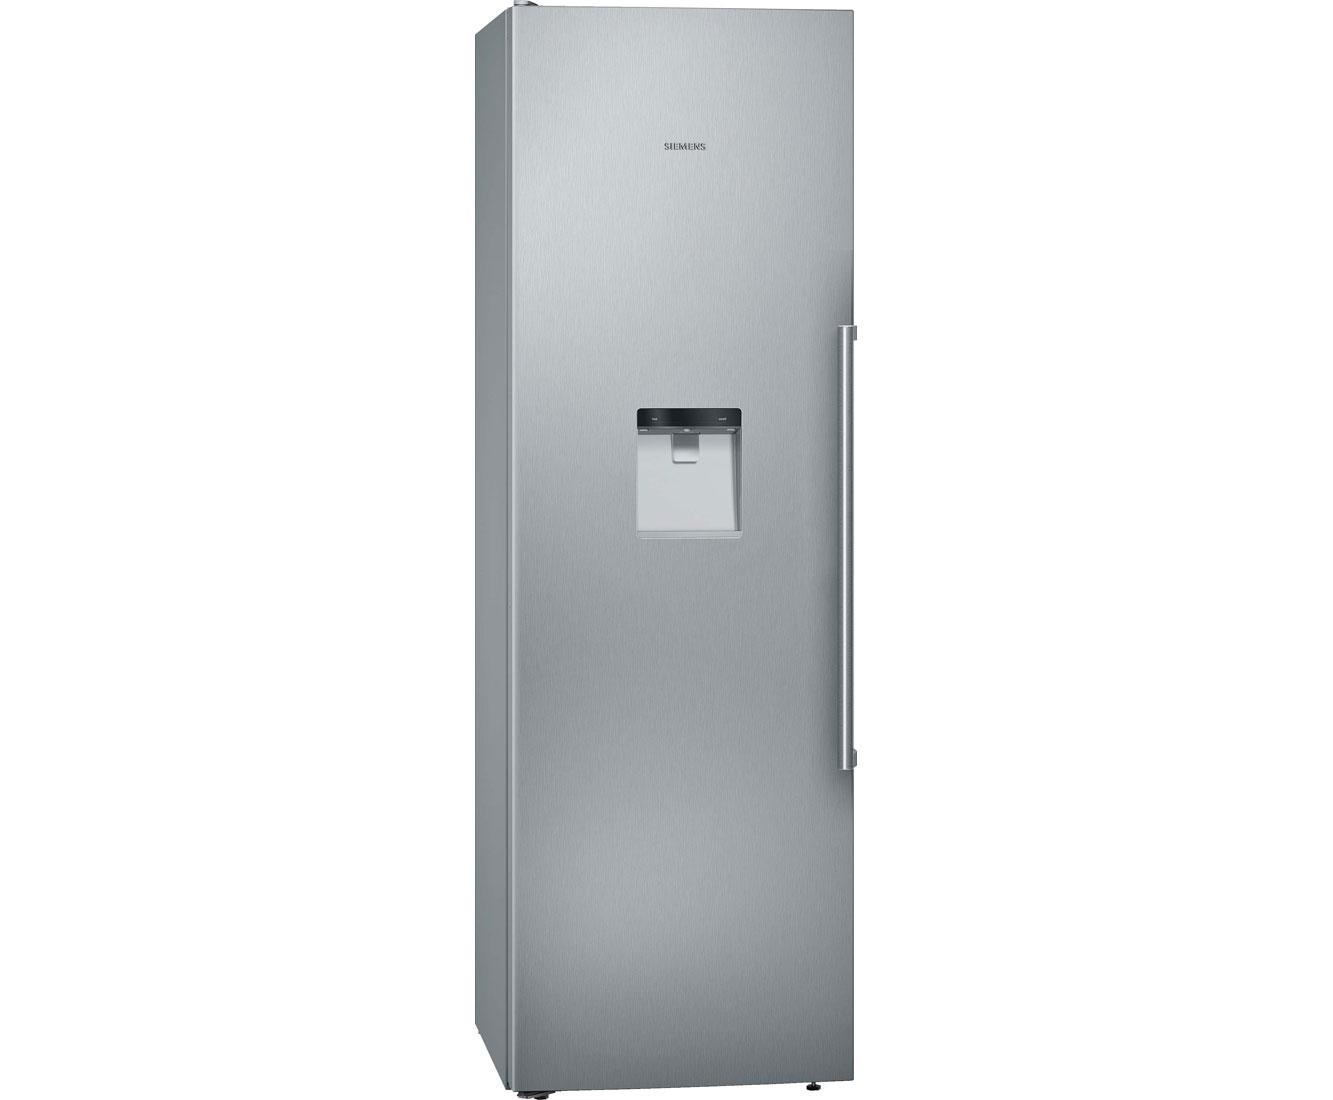 Siemens Iq500 Ks36wbi3p Kuhlschrank Edelstahl A